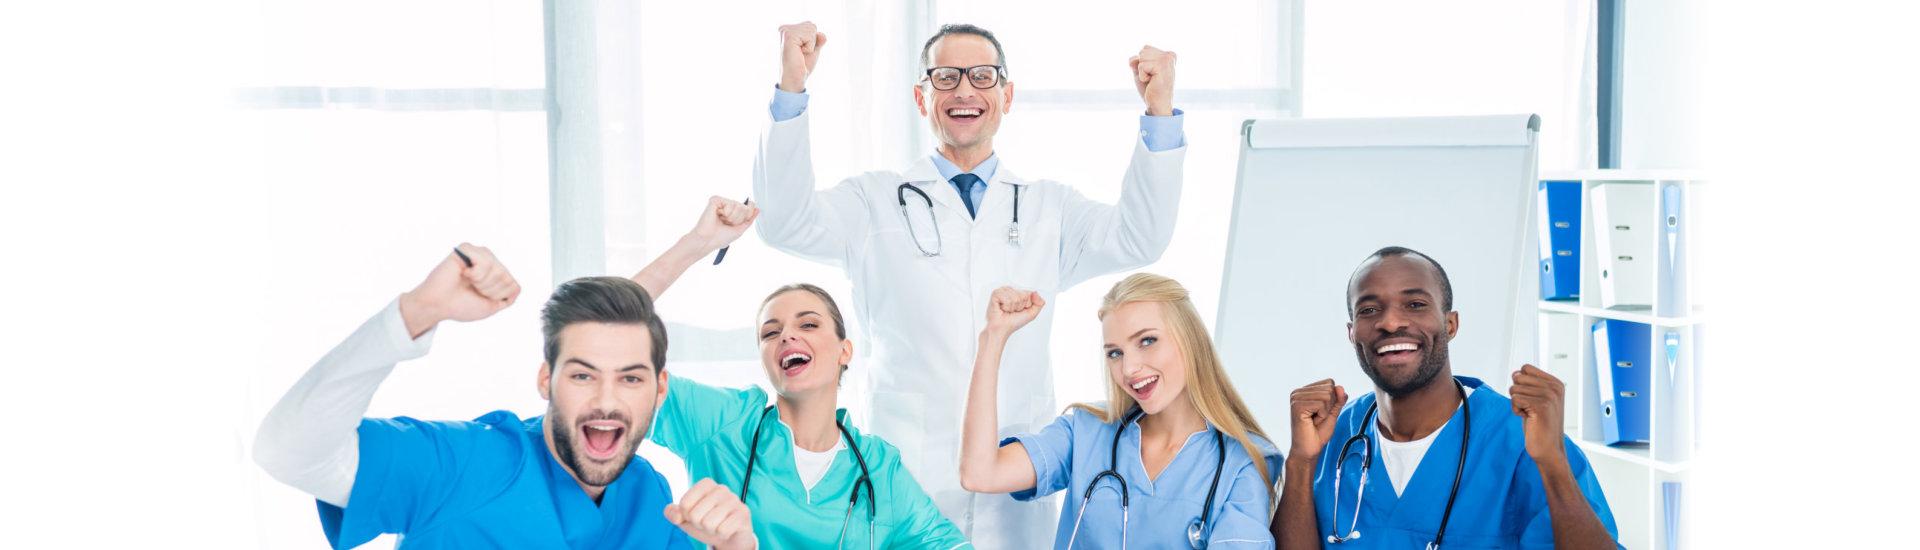 medical workers celebrating